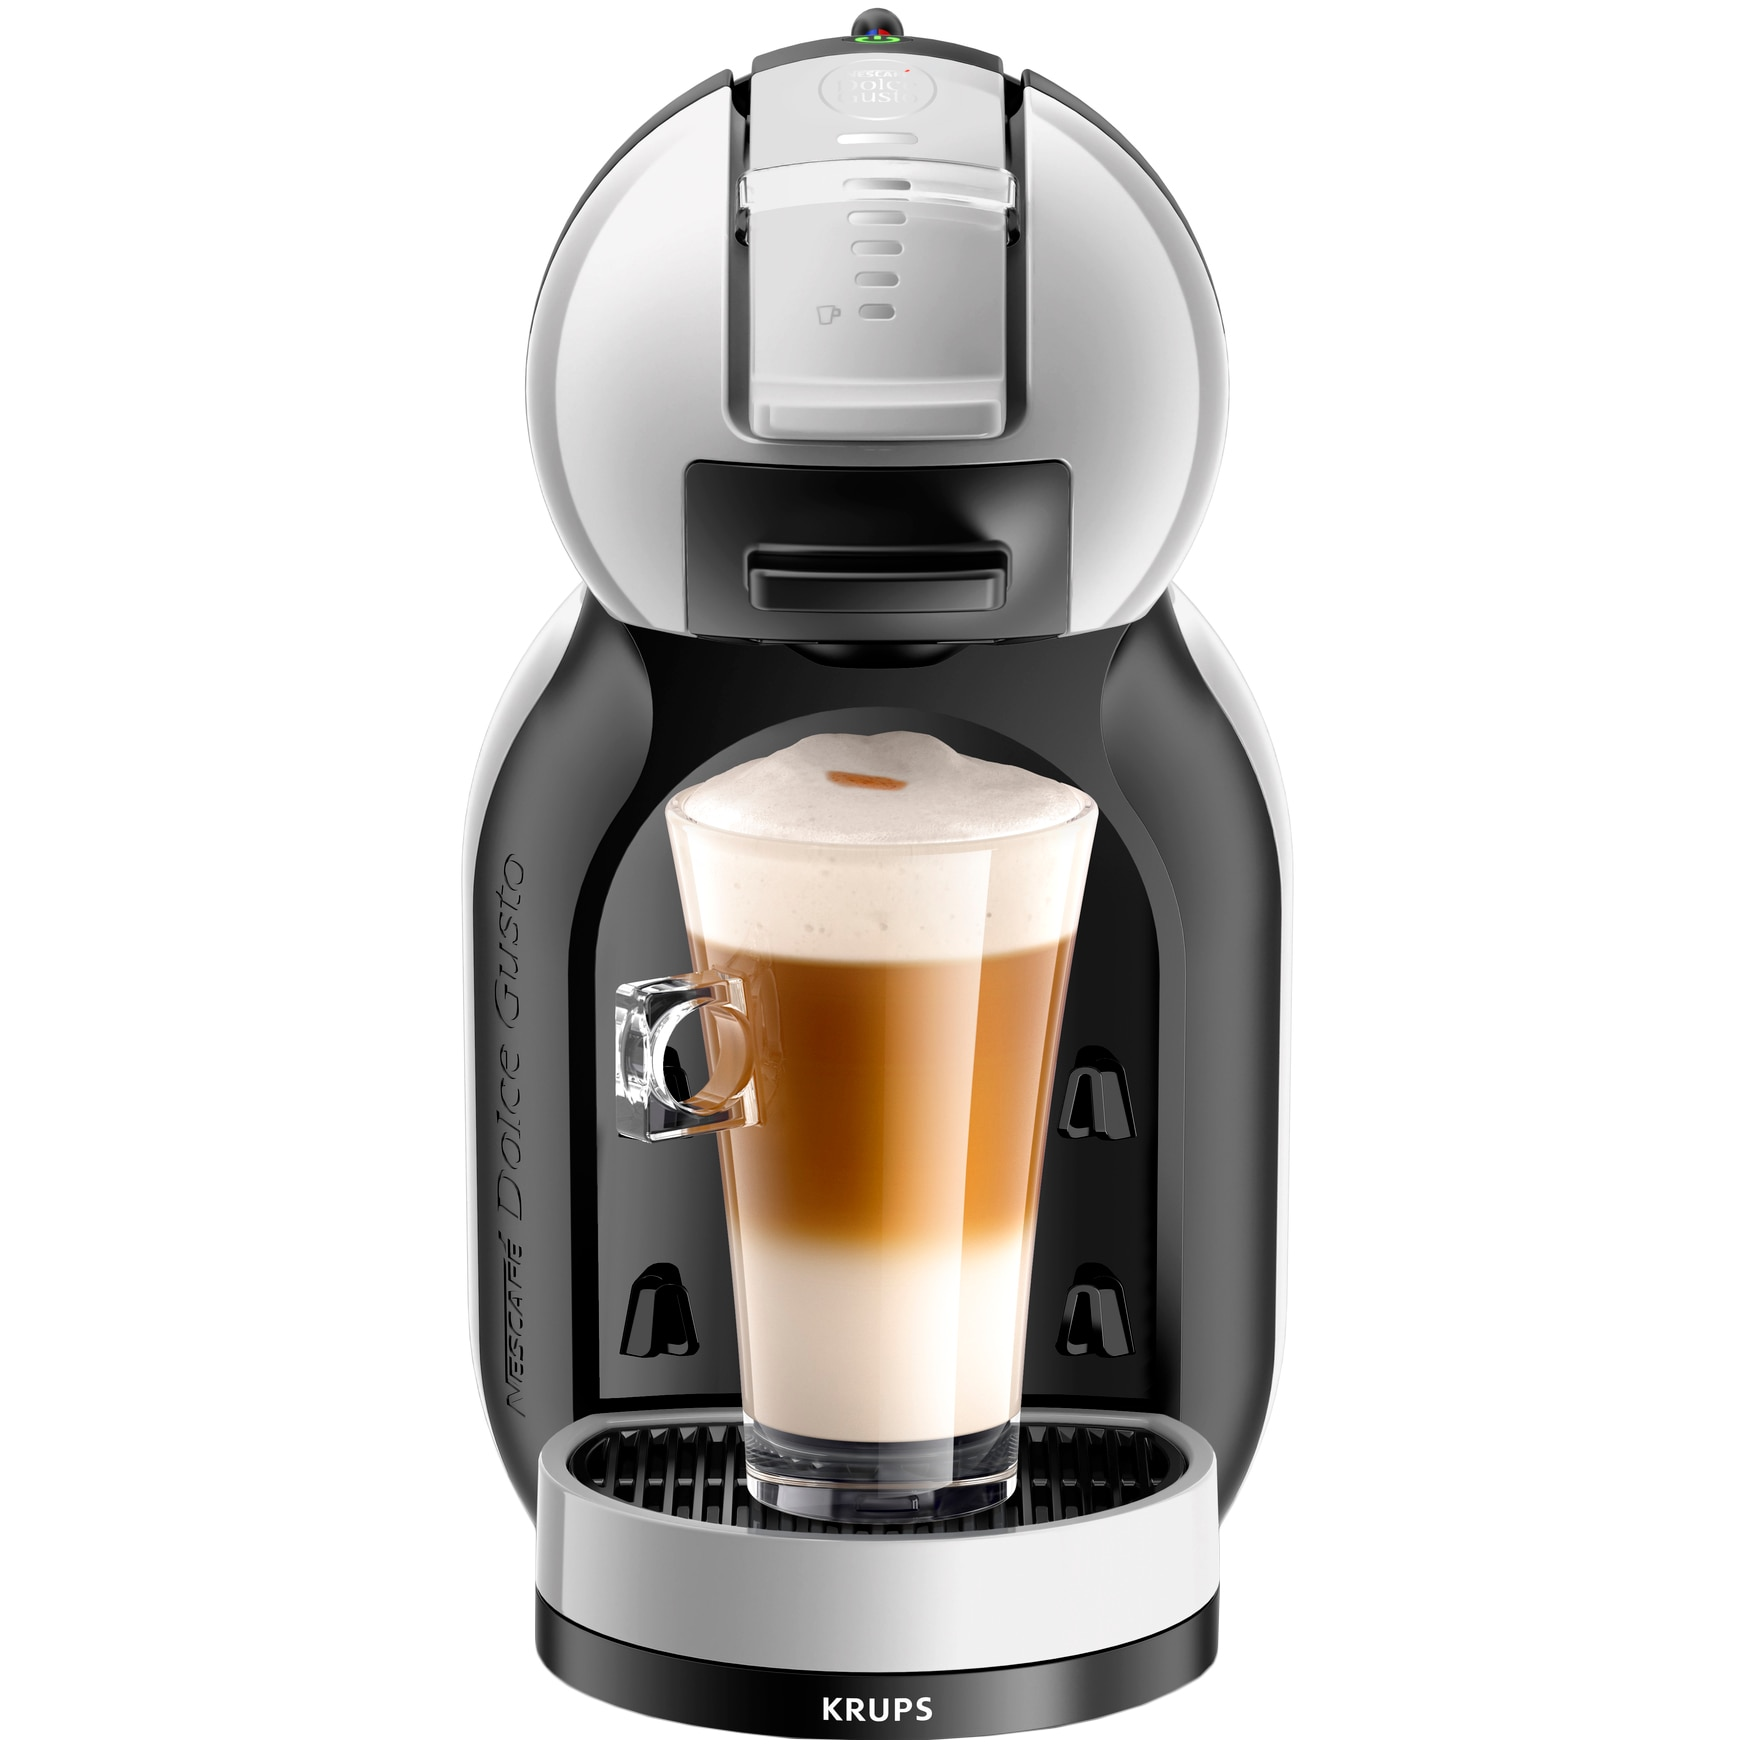 Fotografie Espressor Krups Nescafe Dolce Gusto Mini-Me KP123B31, 1500 W, 0.8 l, 15 bari, Gri